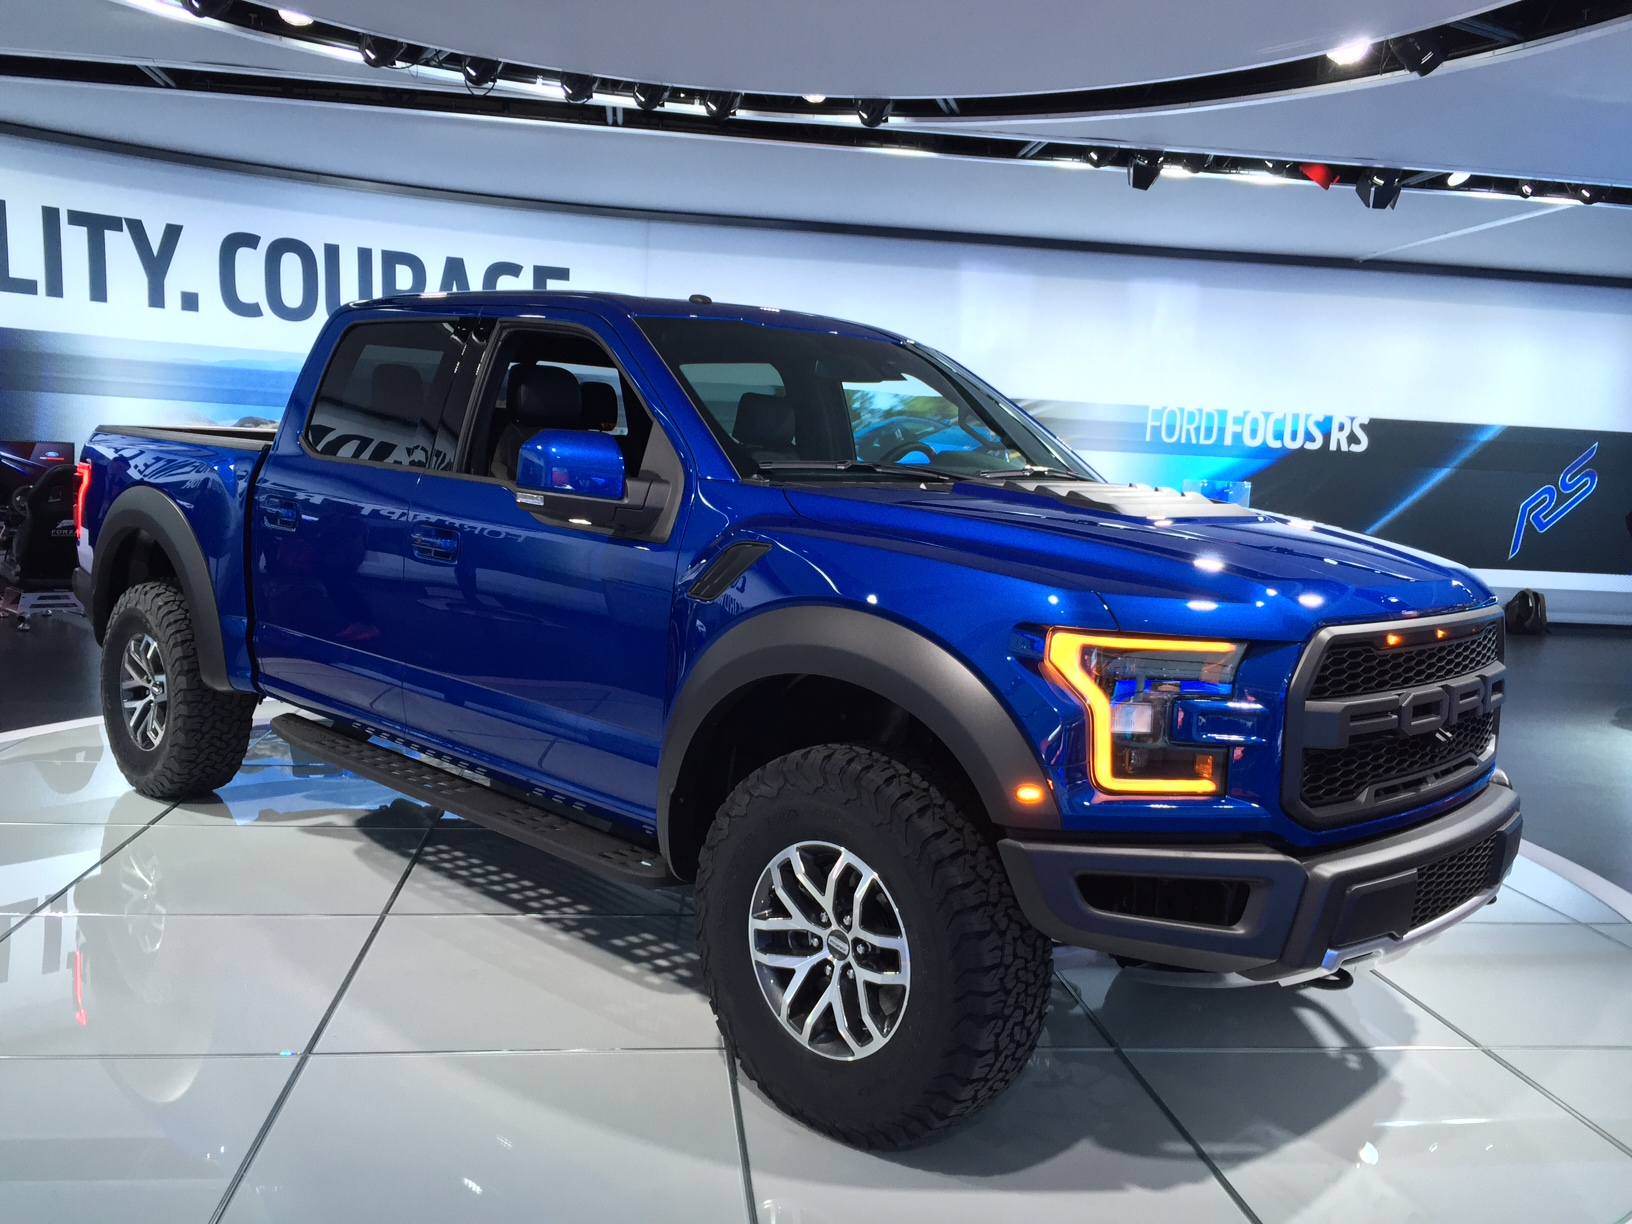 North American International Auto Show 2016: 2017 Ford Raptor ...